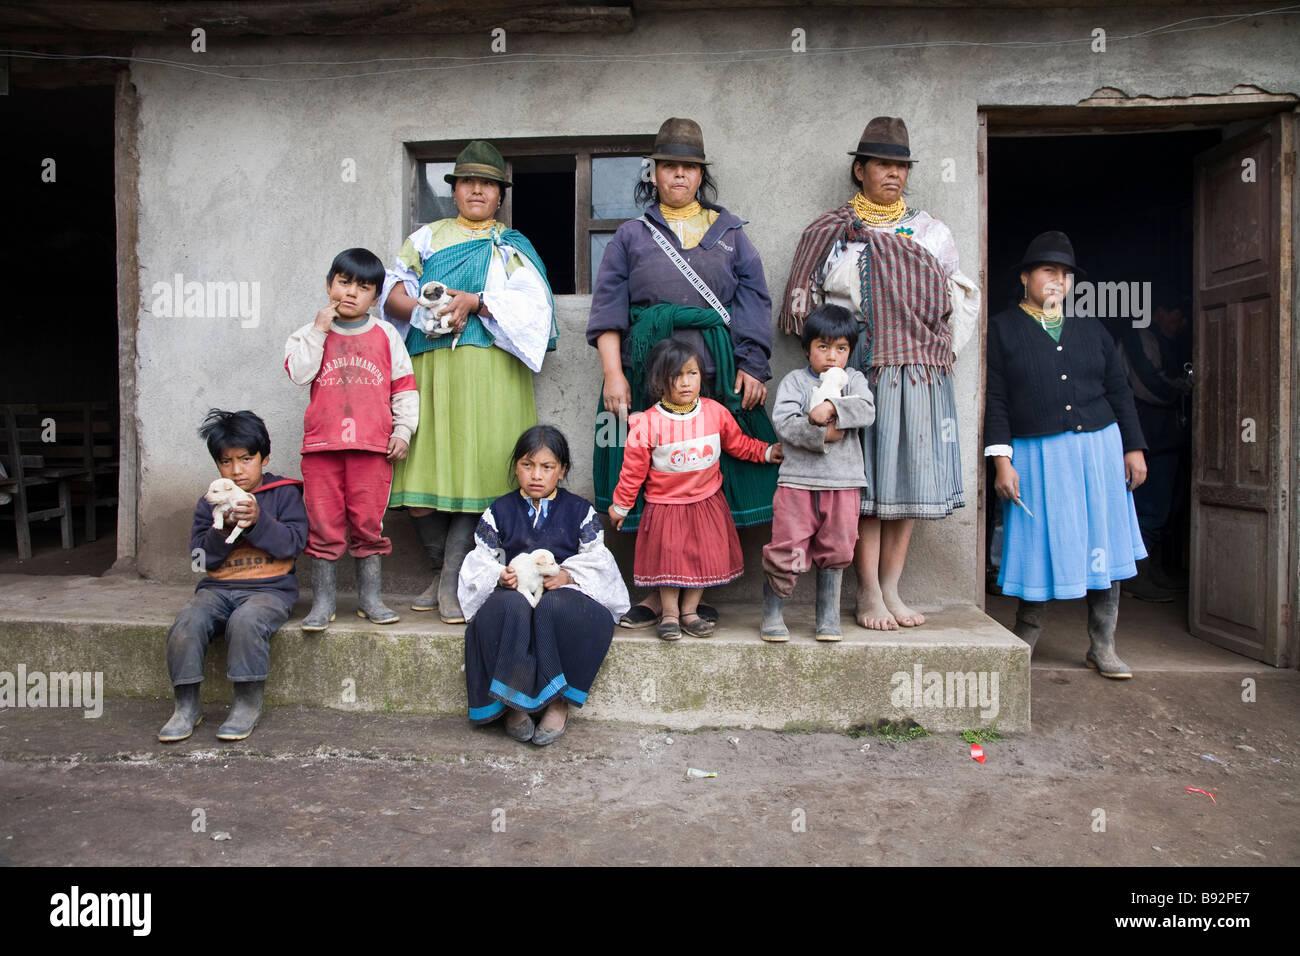 Indigenous Quichua family, San Pablo Lake area, Otavalo Province, Ecuador - Stock Image